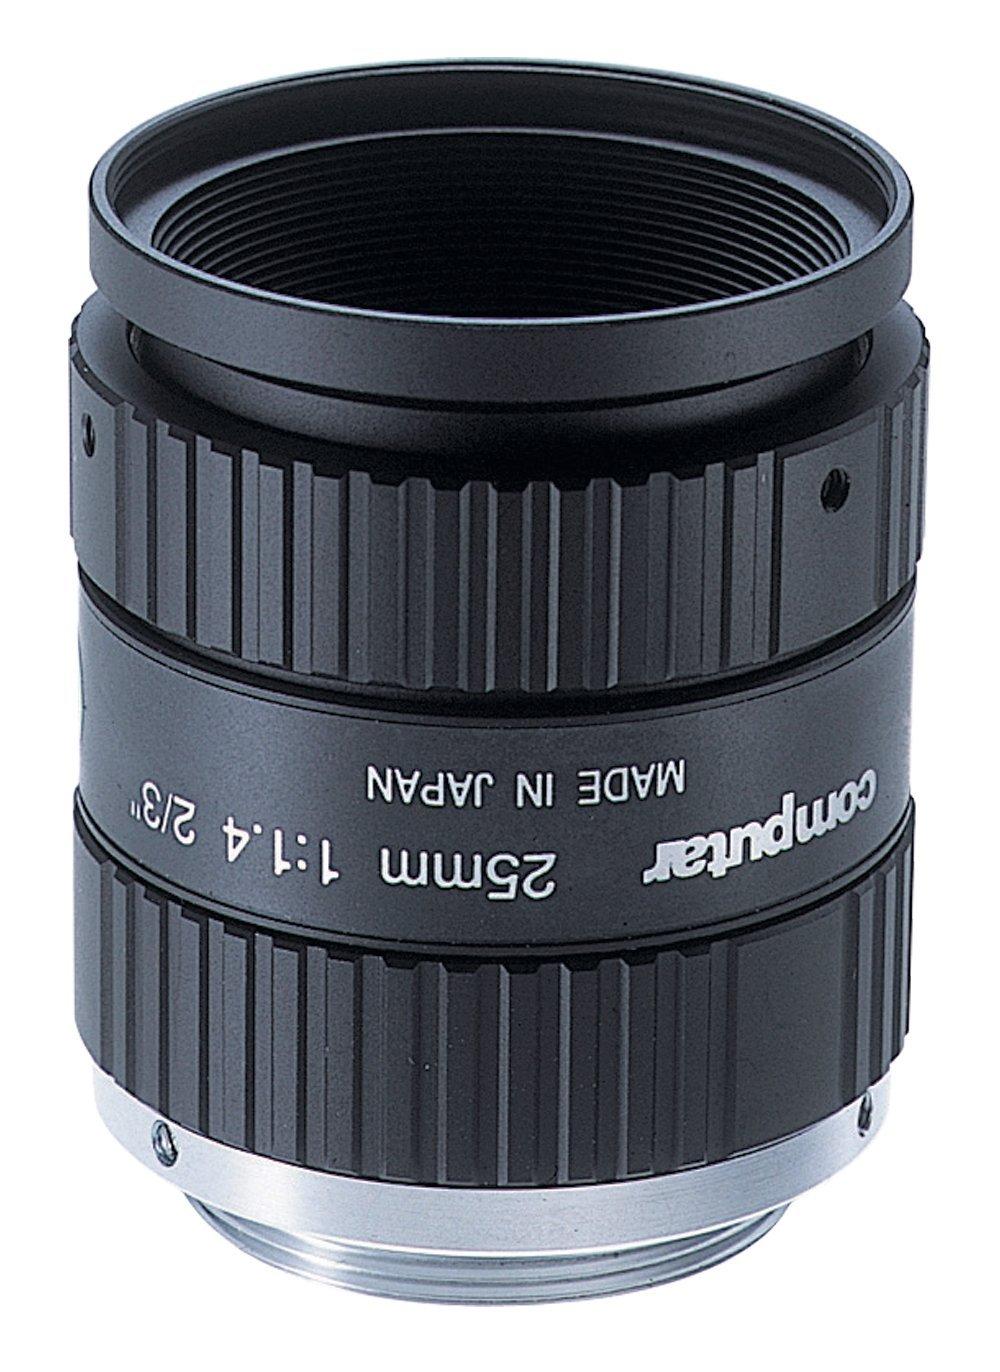 COMPUTAR M2514-MP2 2/3'' 25mm f1.4 w/locking iris & focus, megapixel, C-mount by CBC America